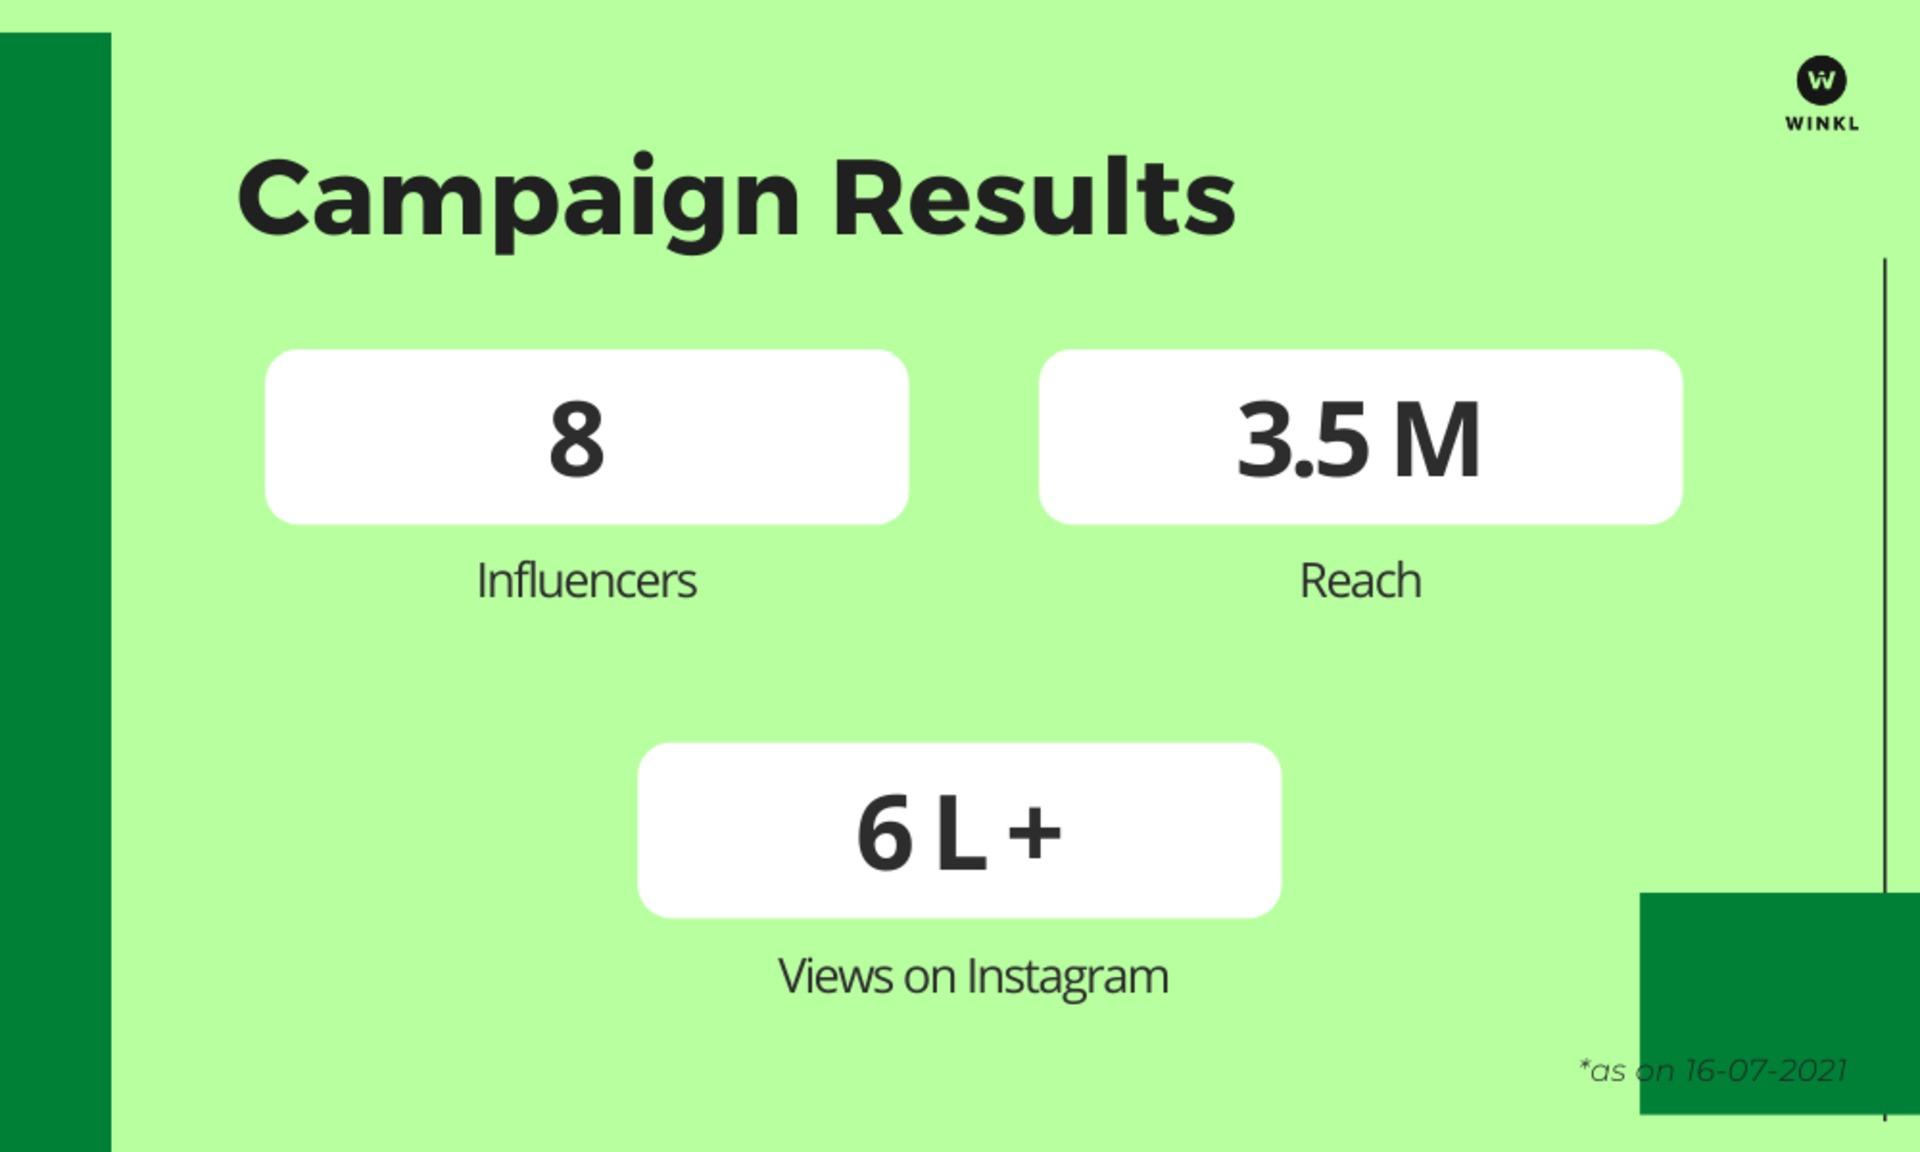 Winkl on Influencer Marketing - Alchemlife Case Study